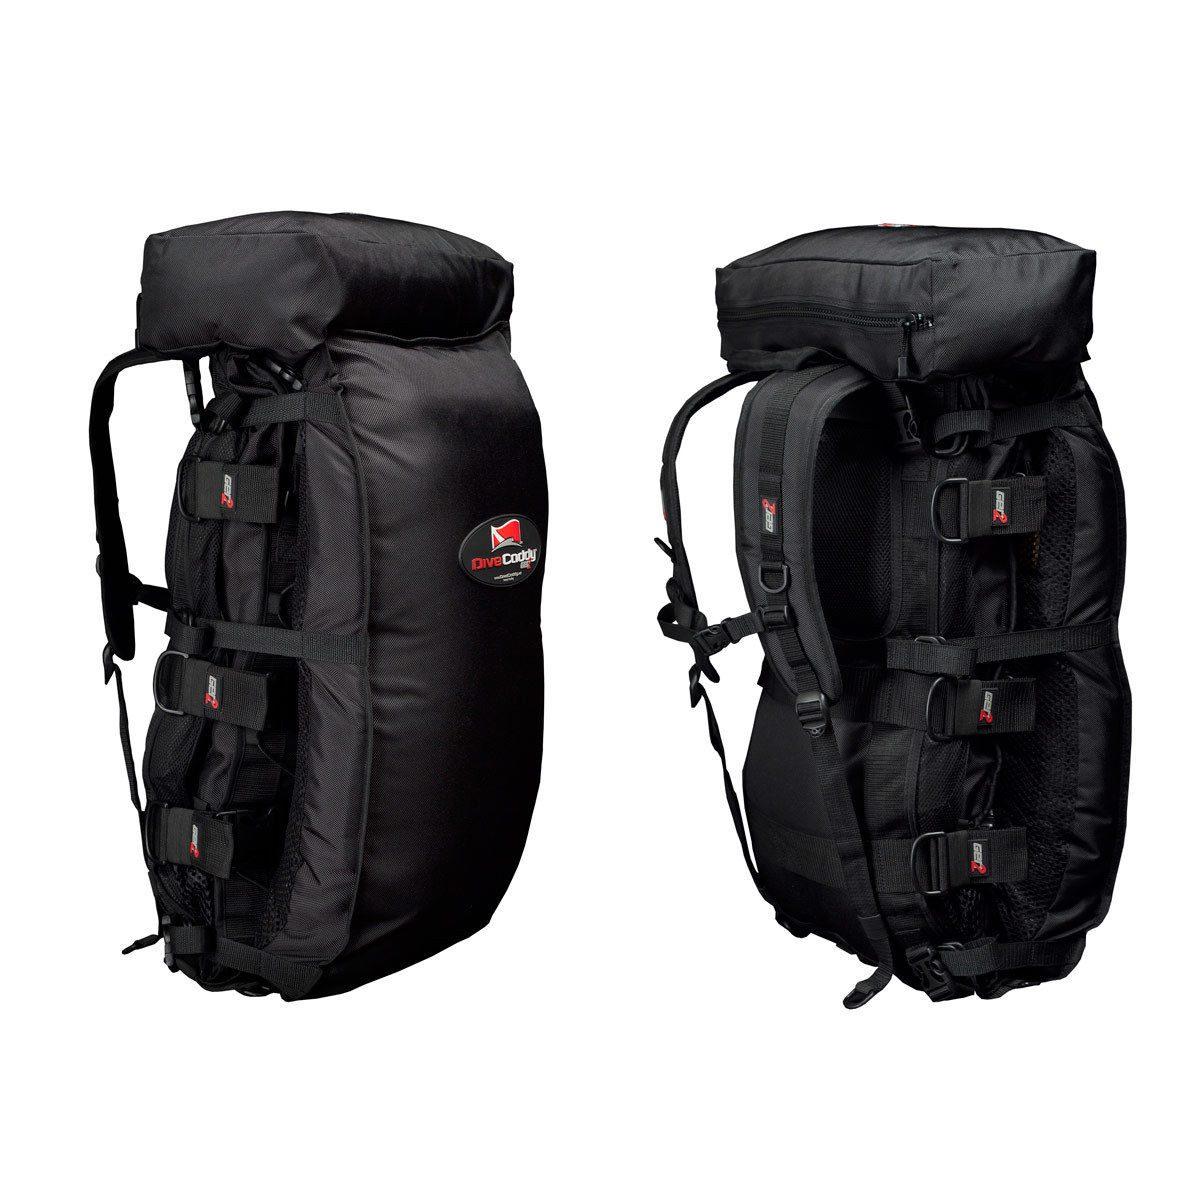 Divecaddy g3 travel bag benthic scuba for Dive gear bag